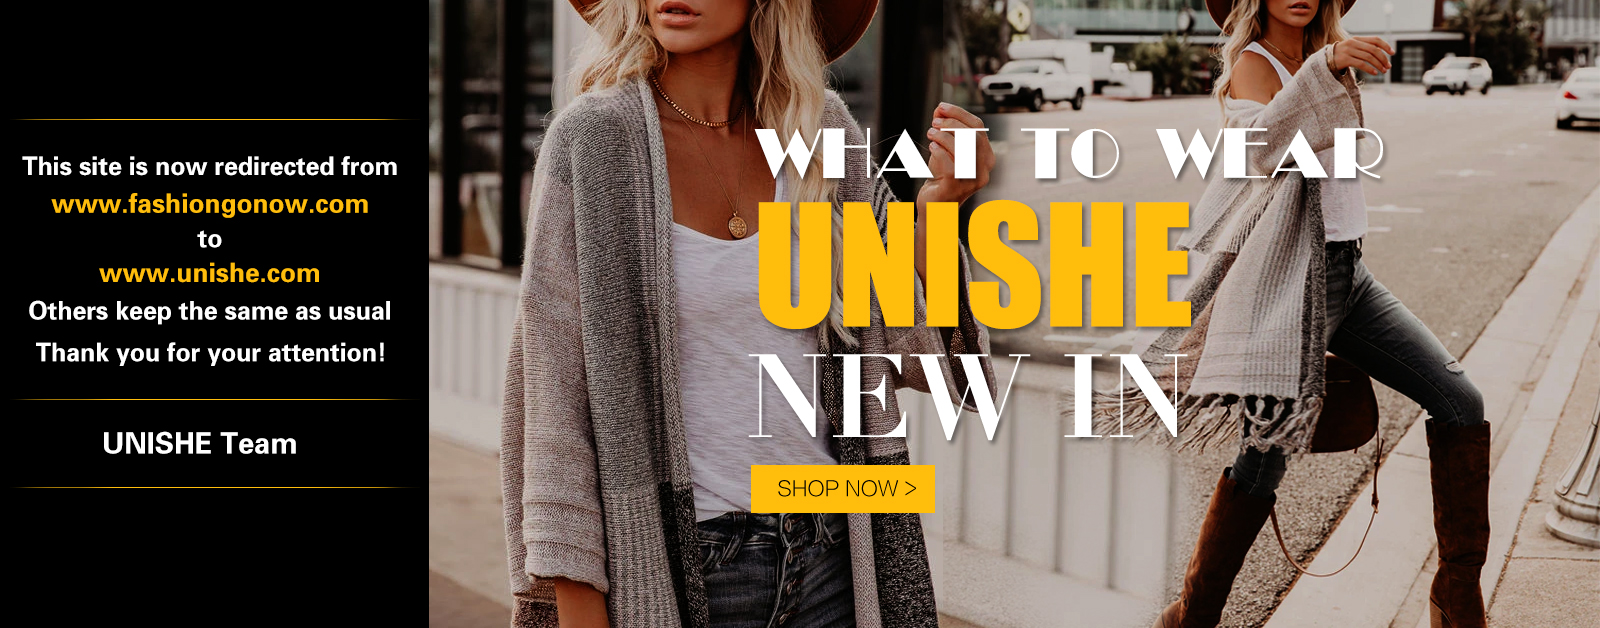 UNISHE NEW IN